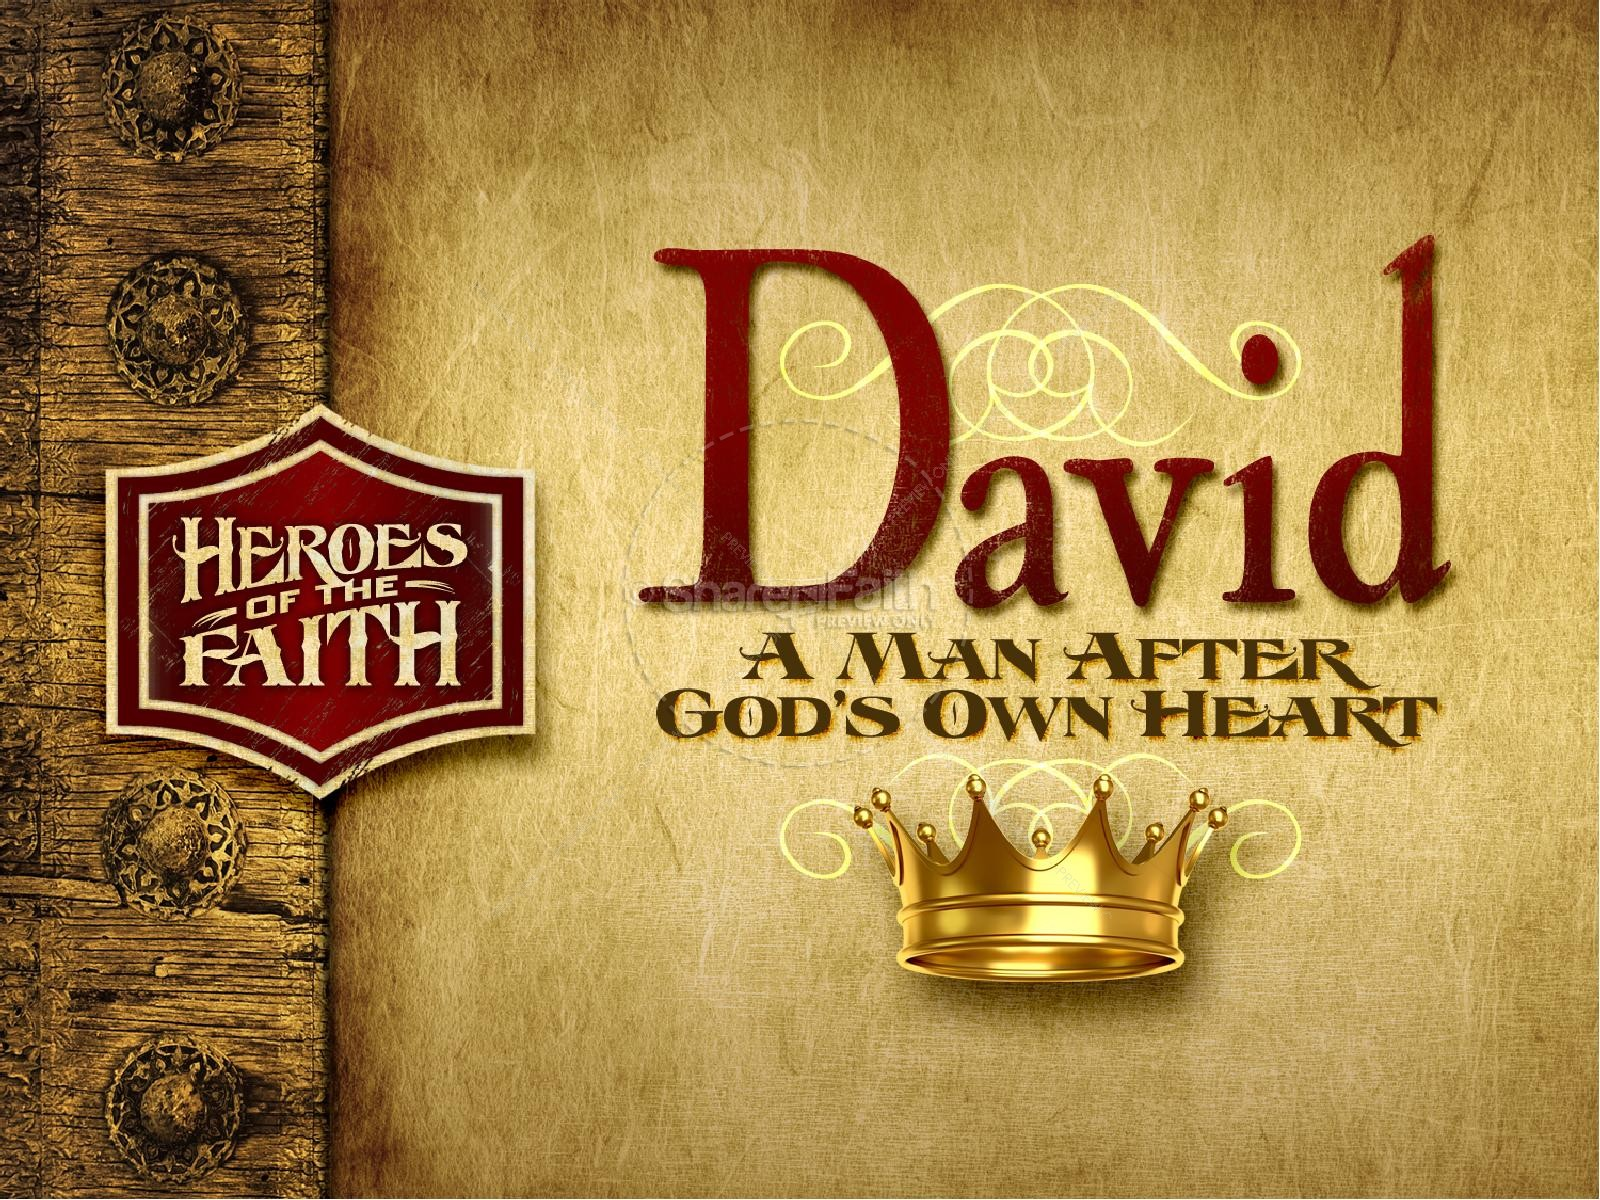 King David PowerPoint Template